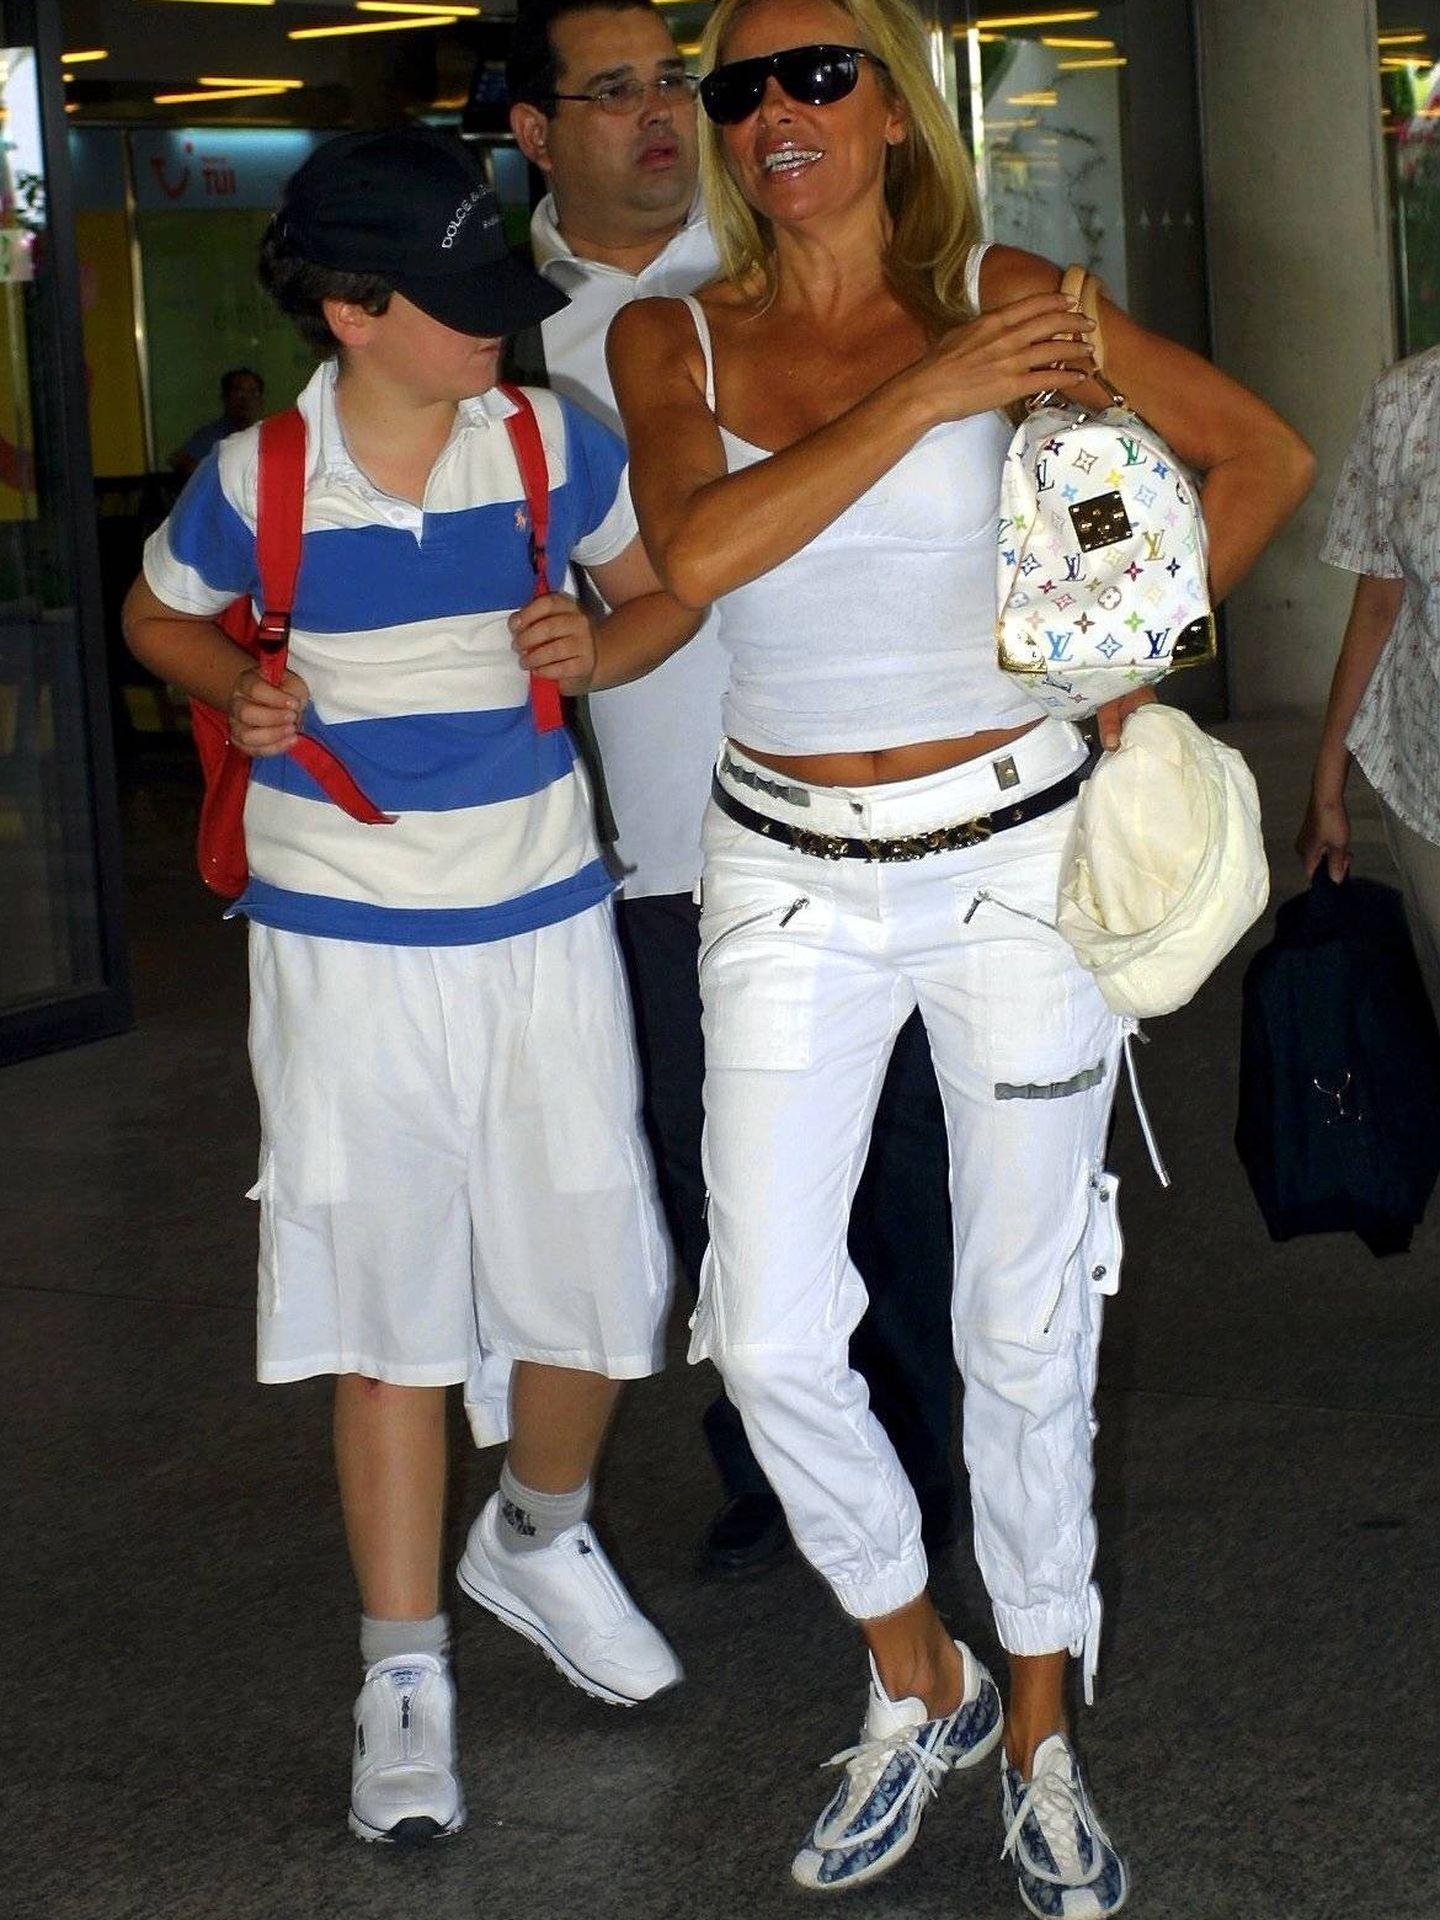 La pareja, en el aeropuerto balear. (Cordon Press)